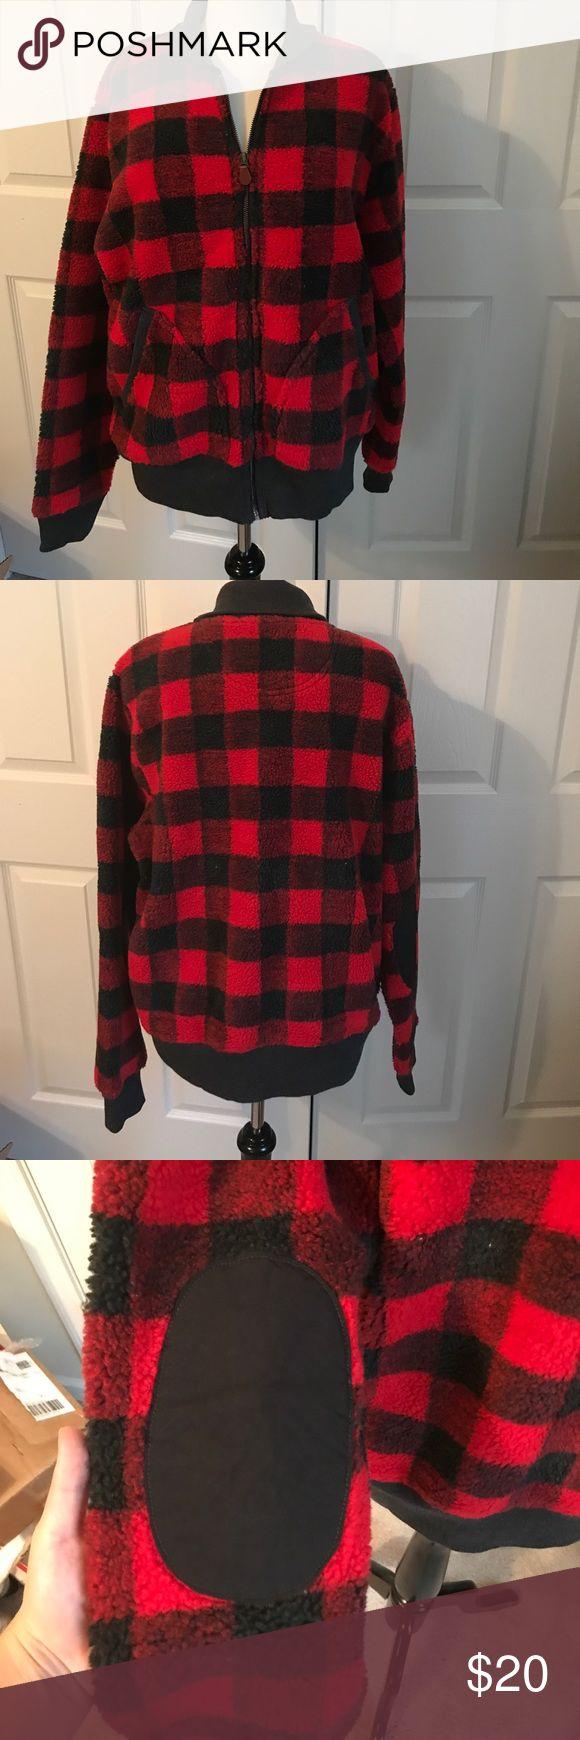 Gap jacket Brand new! Has pockets and elbow patches, full zip GAP Jackets & Coats